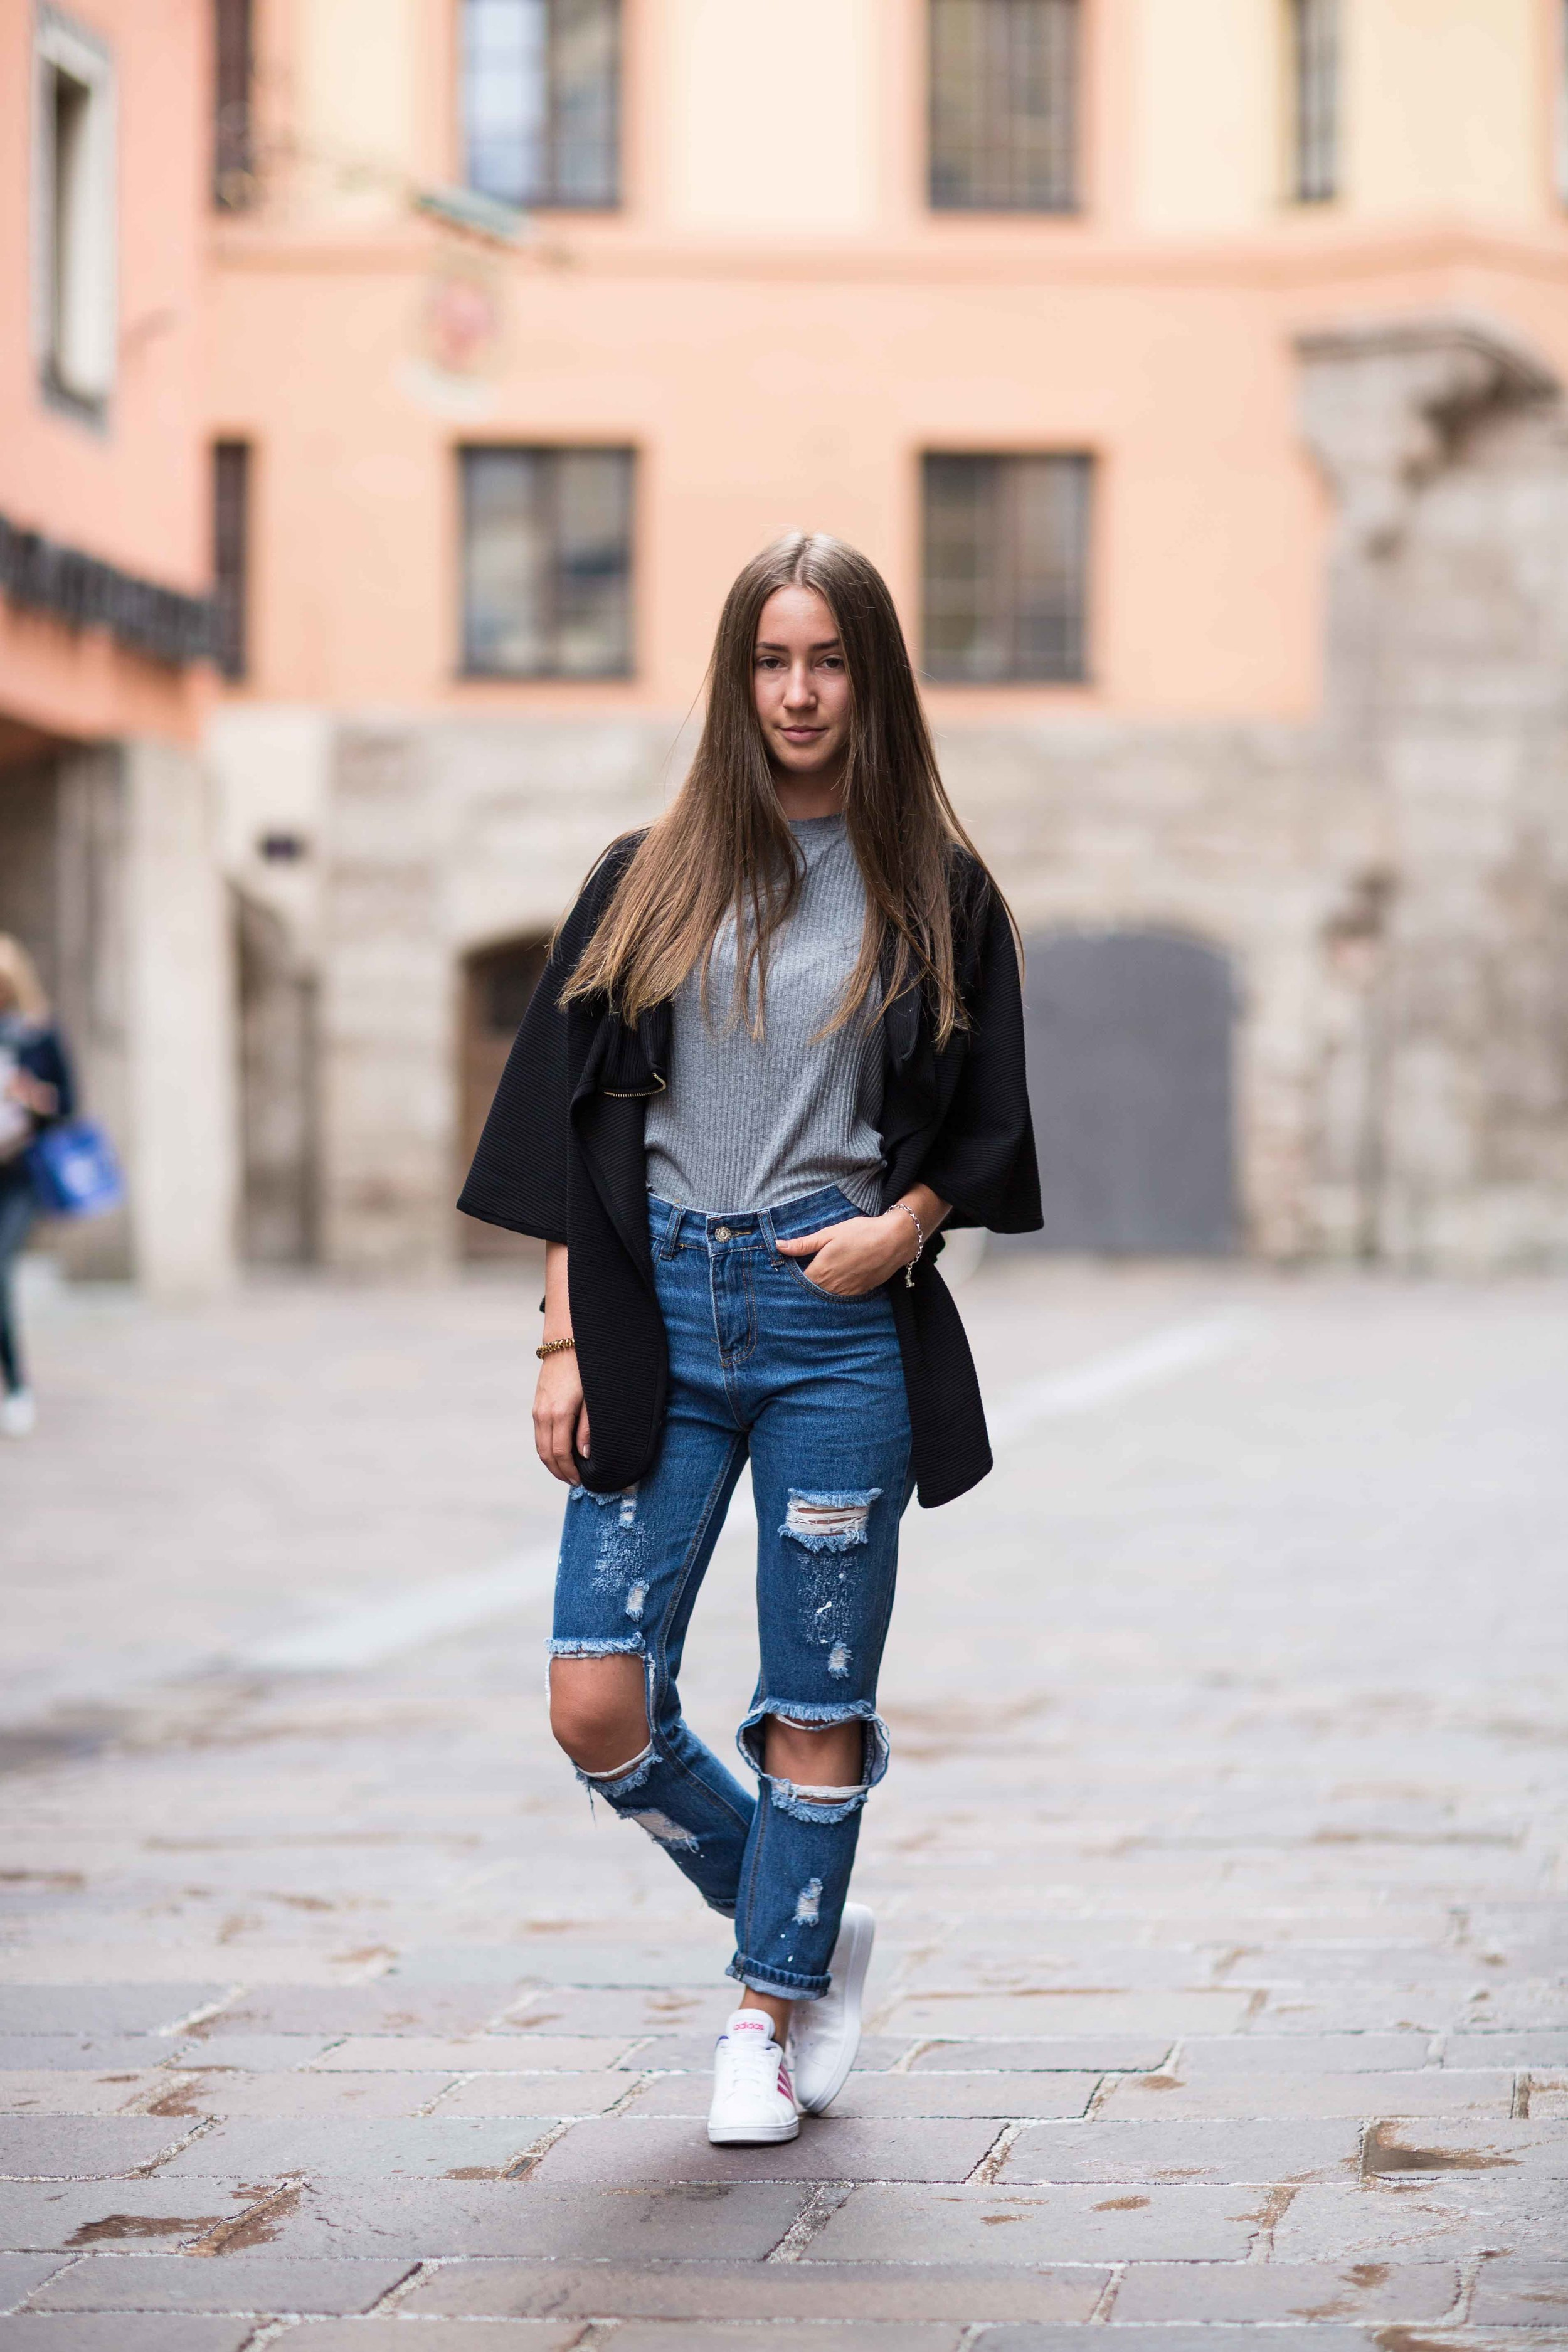 street-style-fashion-blog-innsbruck-michelle